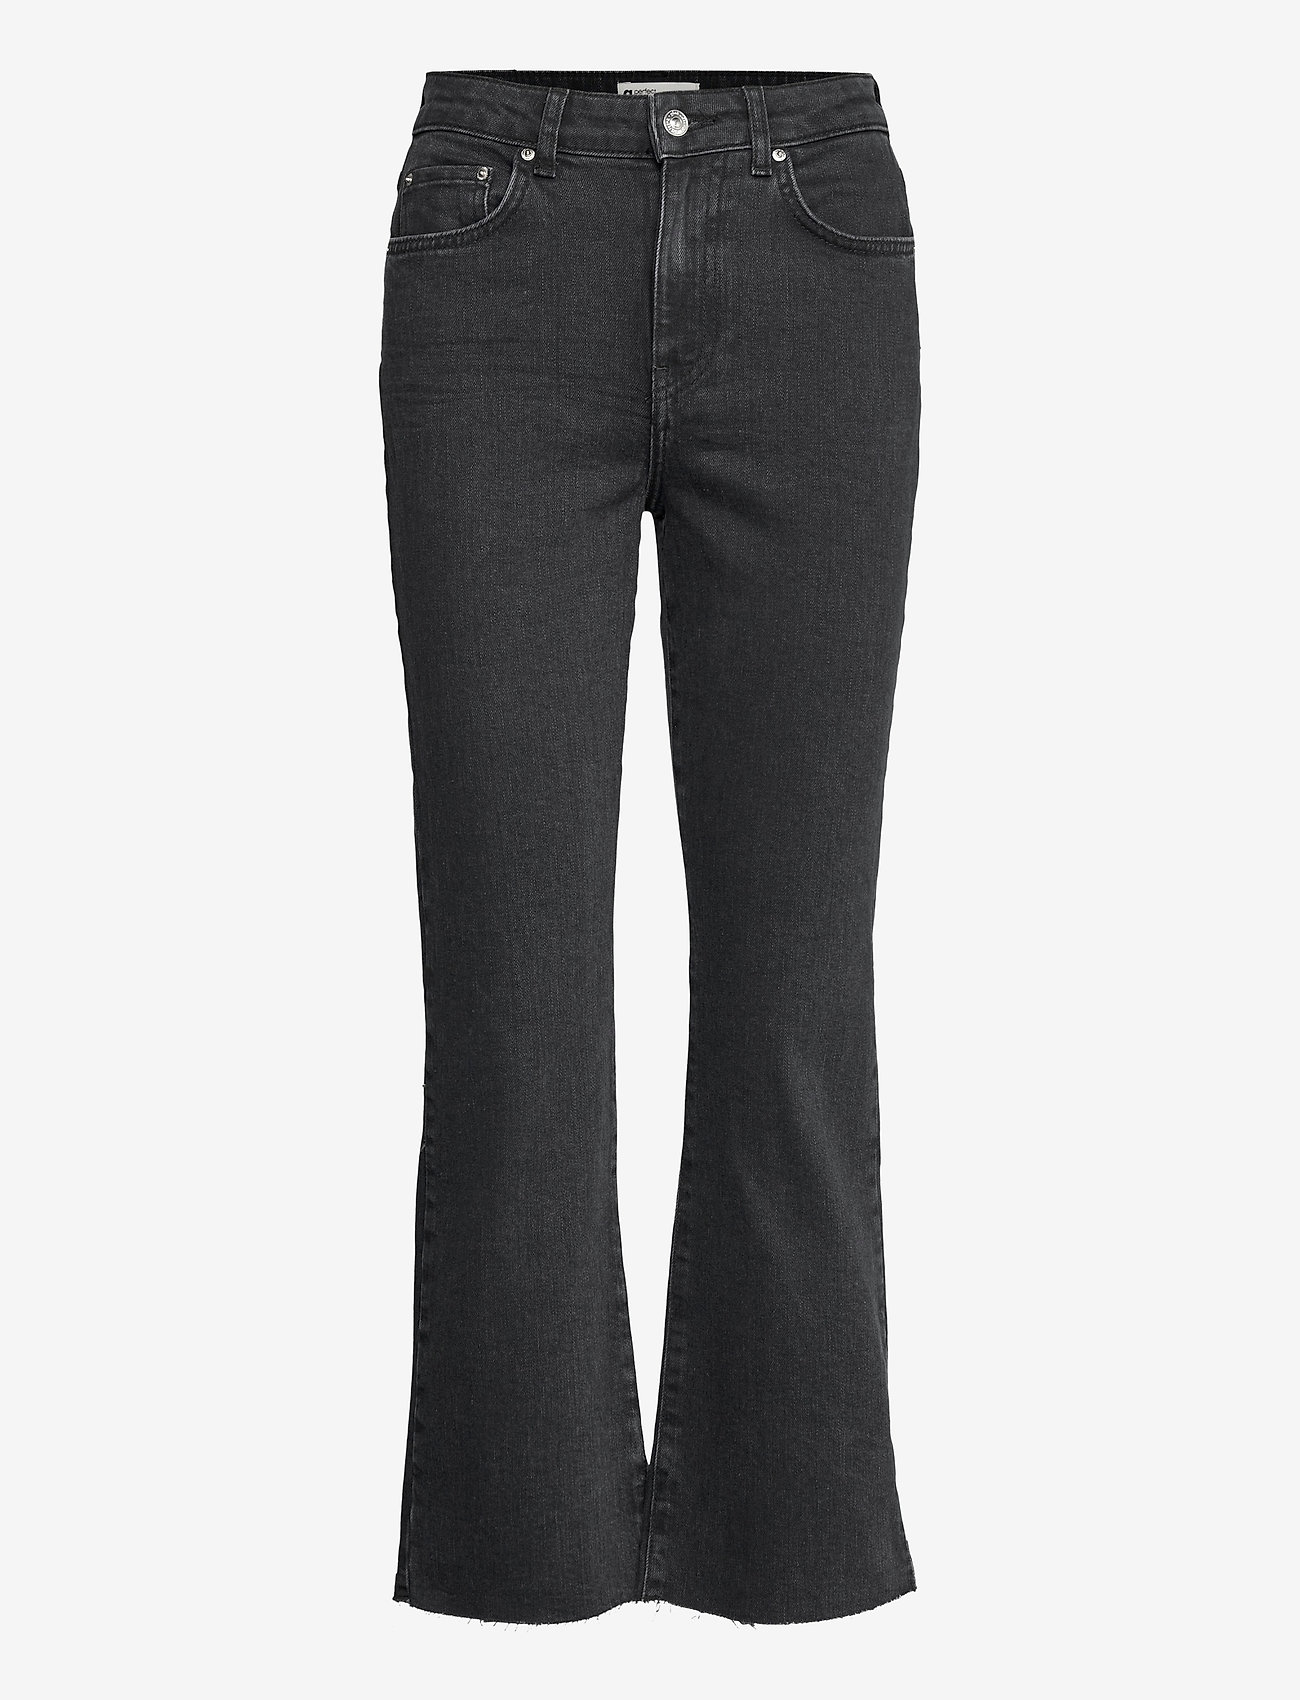 Gina Tricot - Ylva kick flare jeans - schlaghosen - offblack - 0